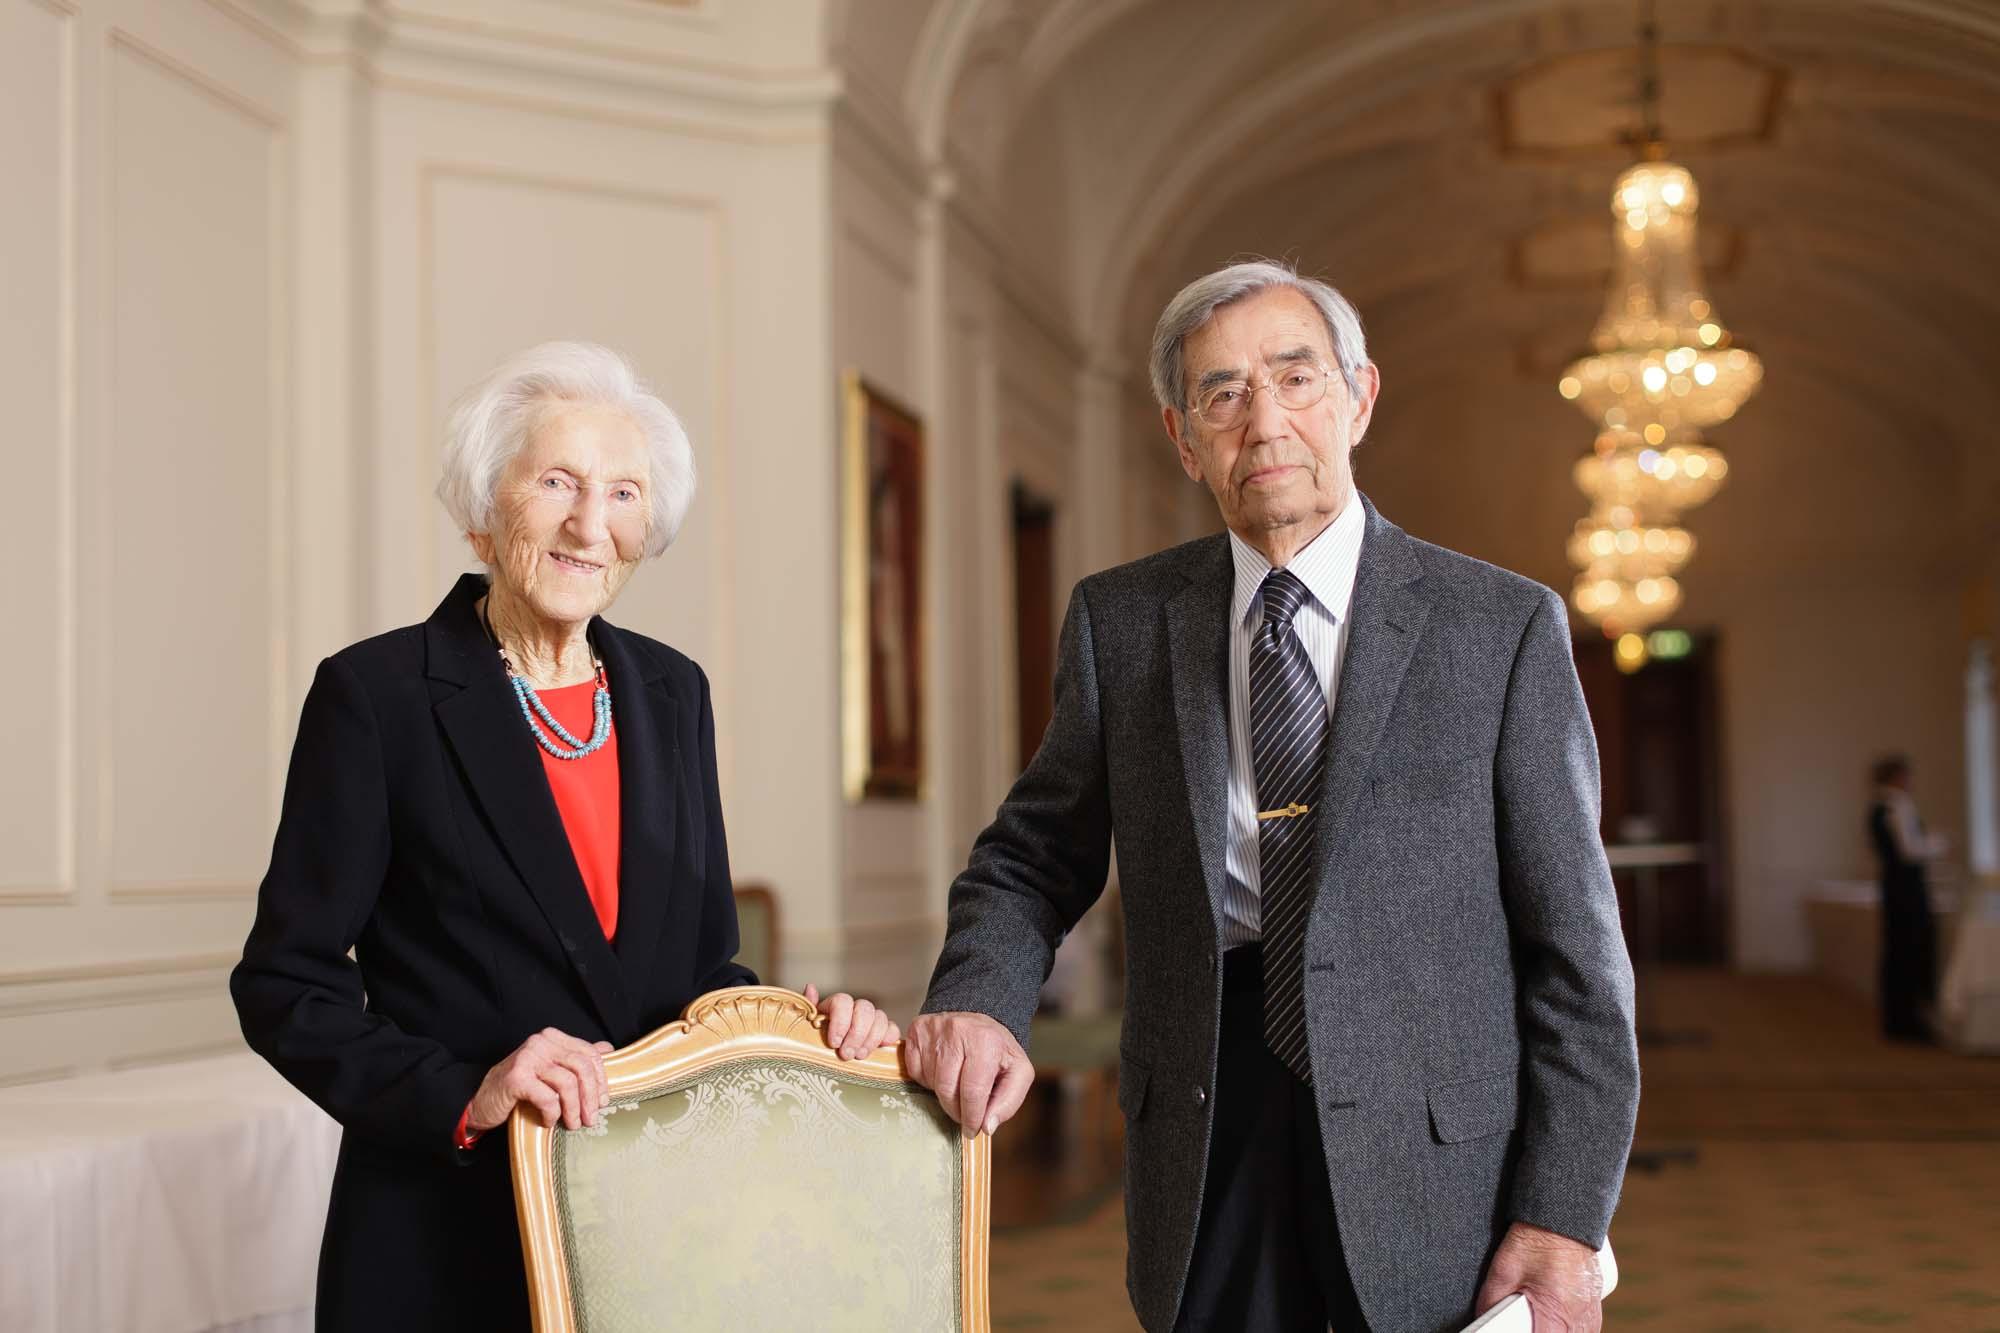 Hédi Fried och Emerich Roth. Foto: Björn Qvarfordt.